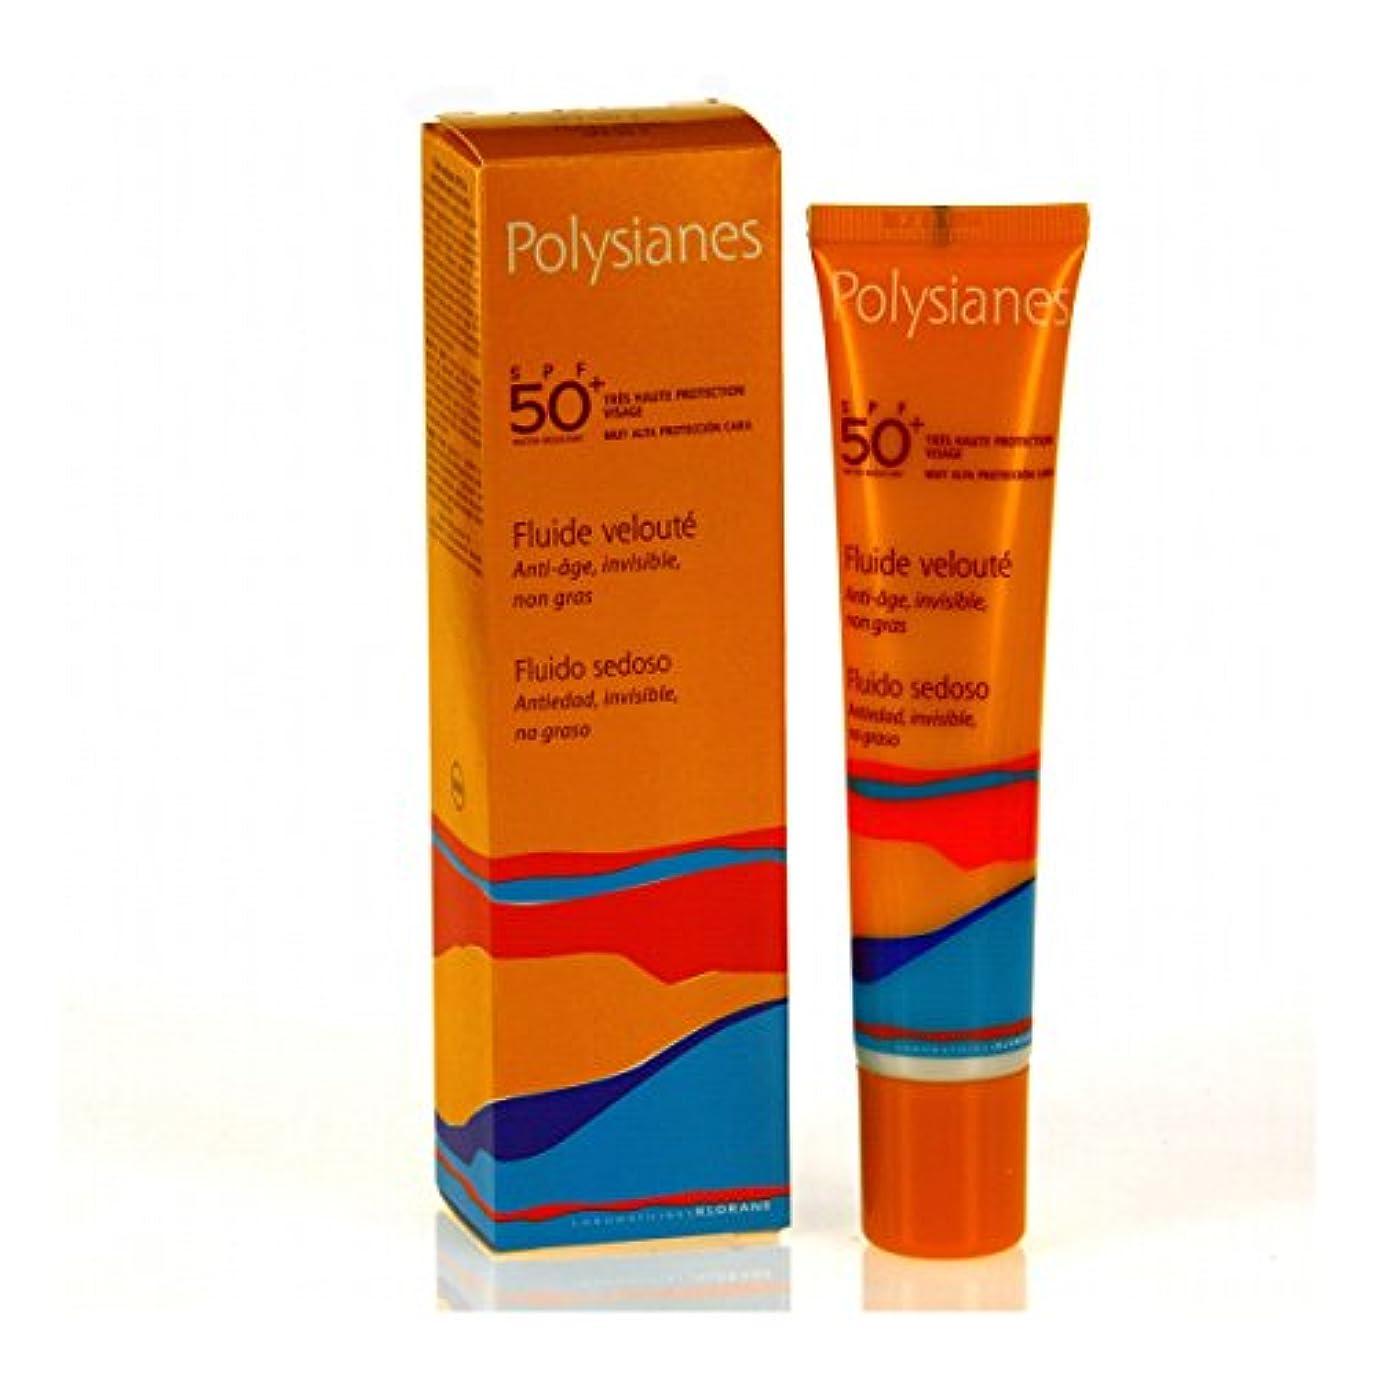 予報漁師雑品Polysianes Velvety Fluid Spf 50+ 40ml [並行輸入品]